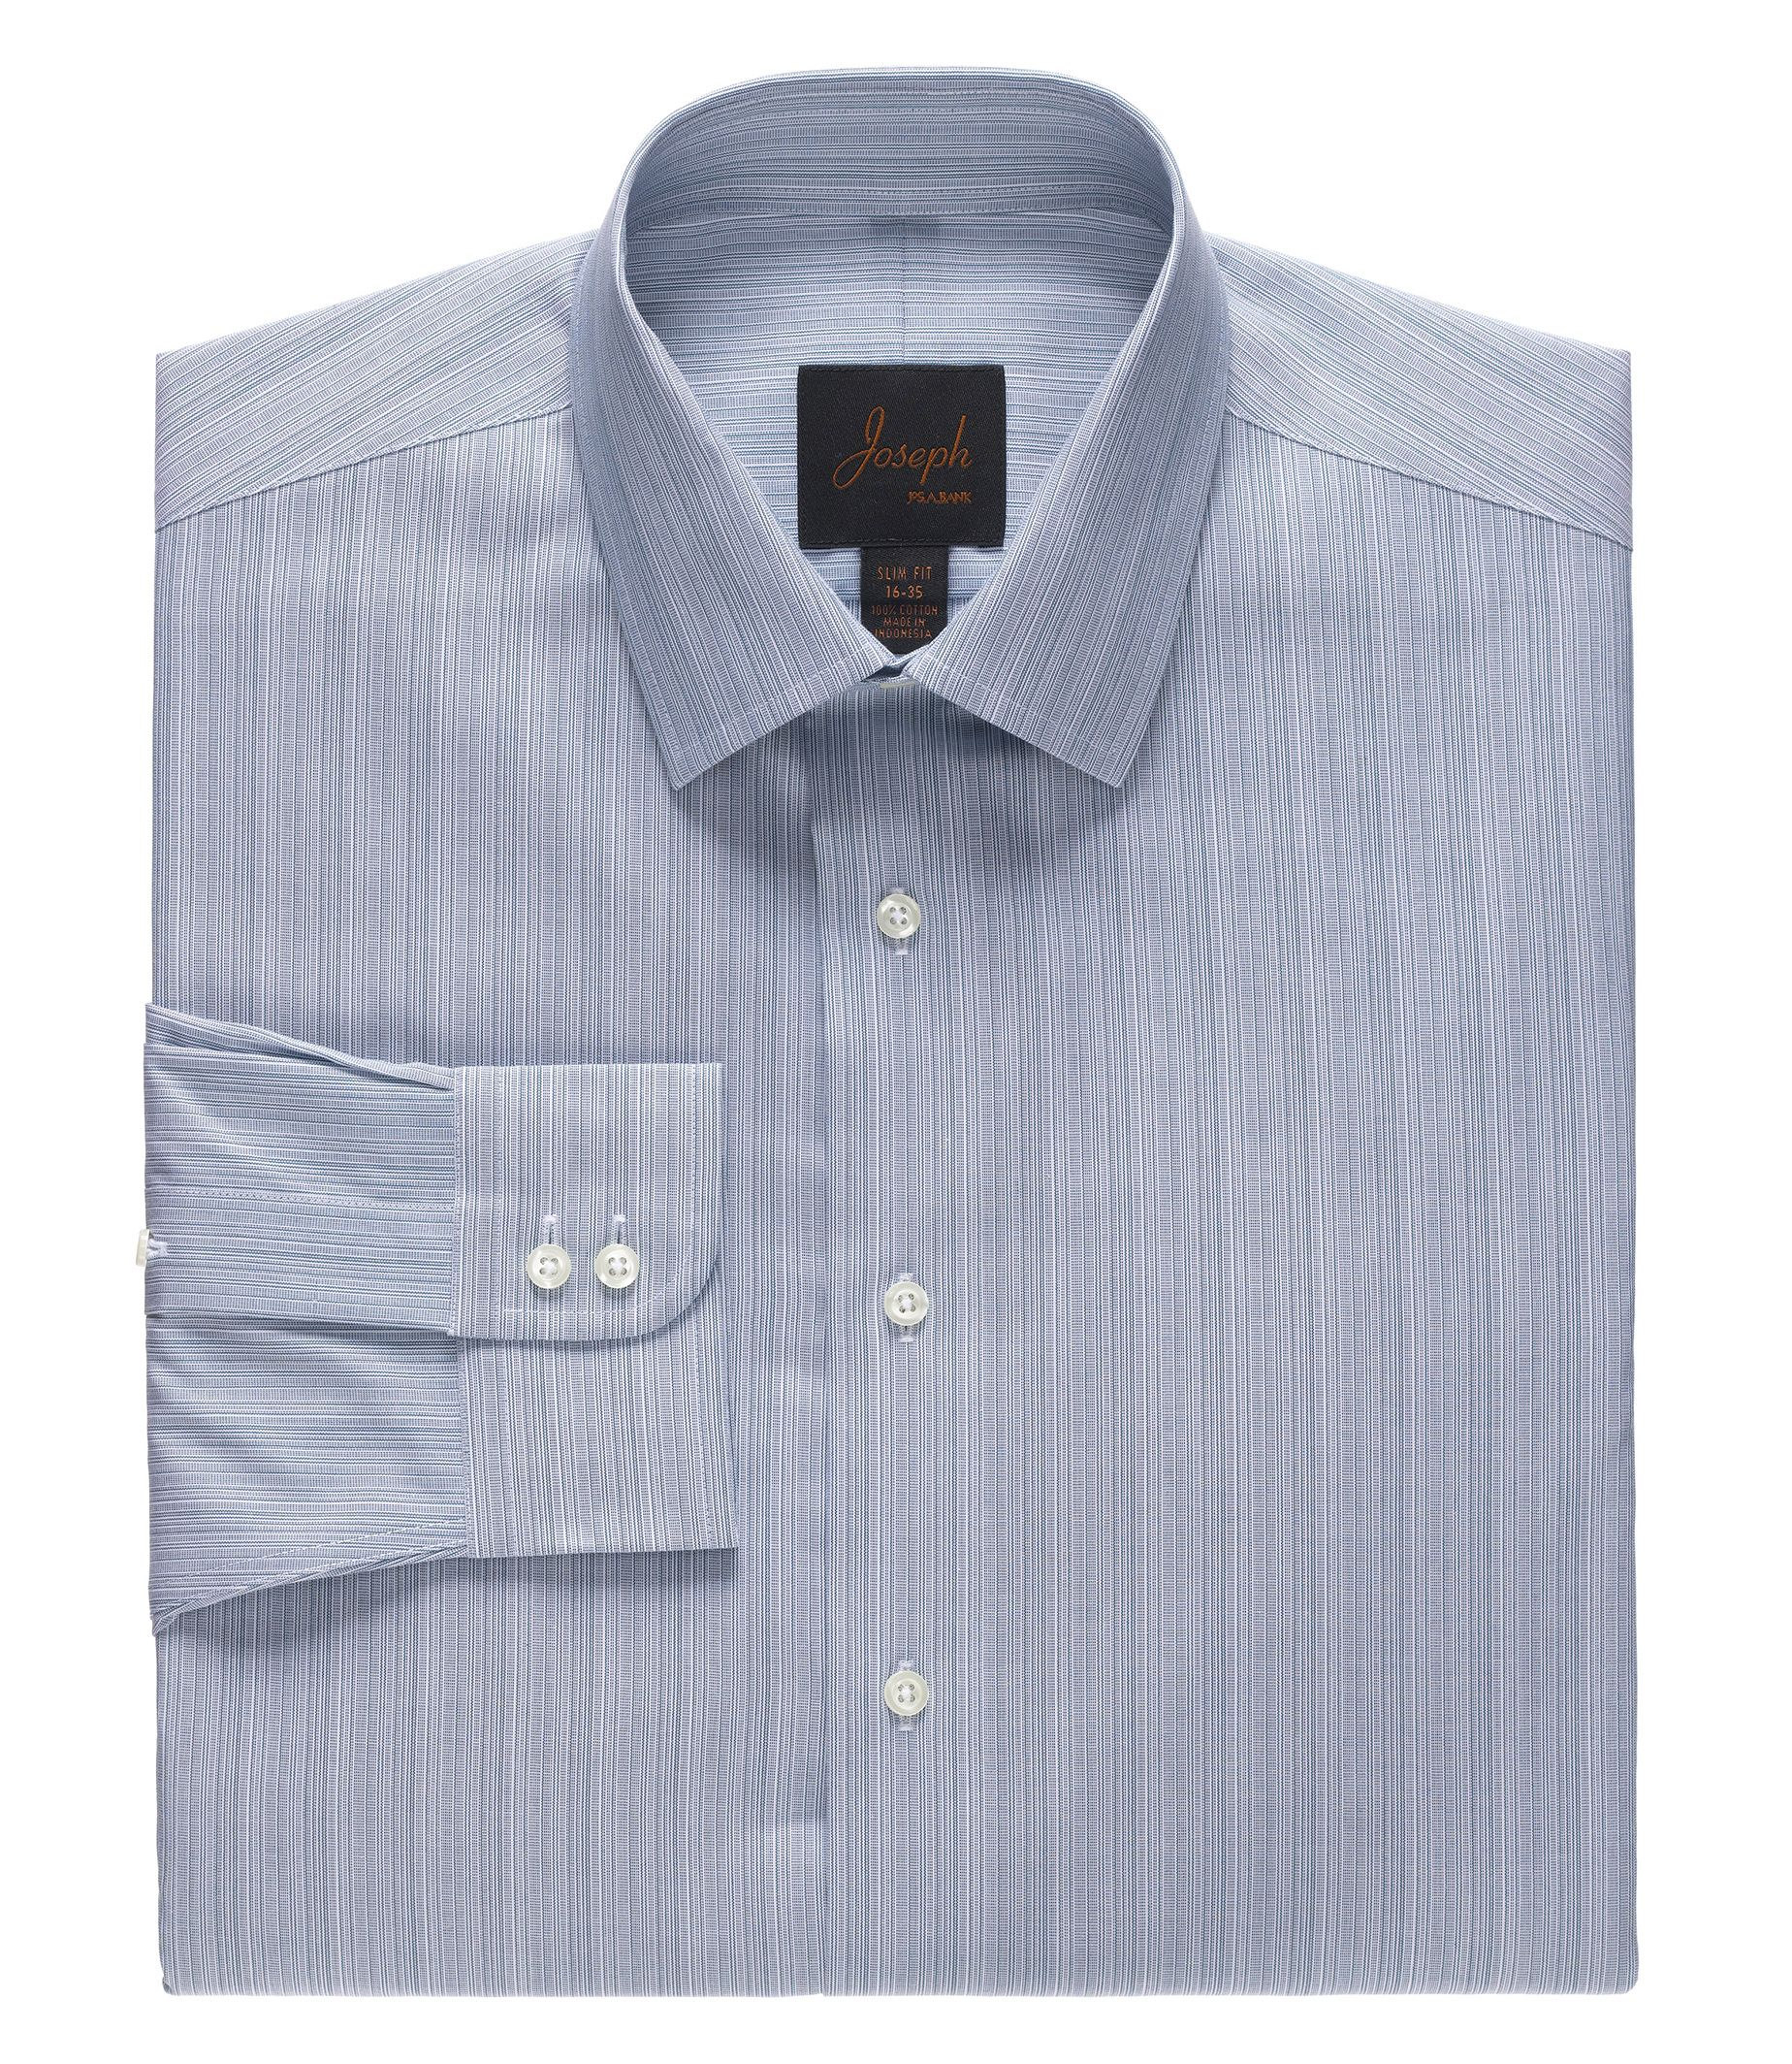 Joseph Spread Collar Slim Fit Muted Stripe Dress Shirt